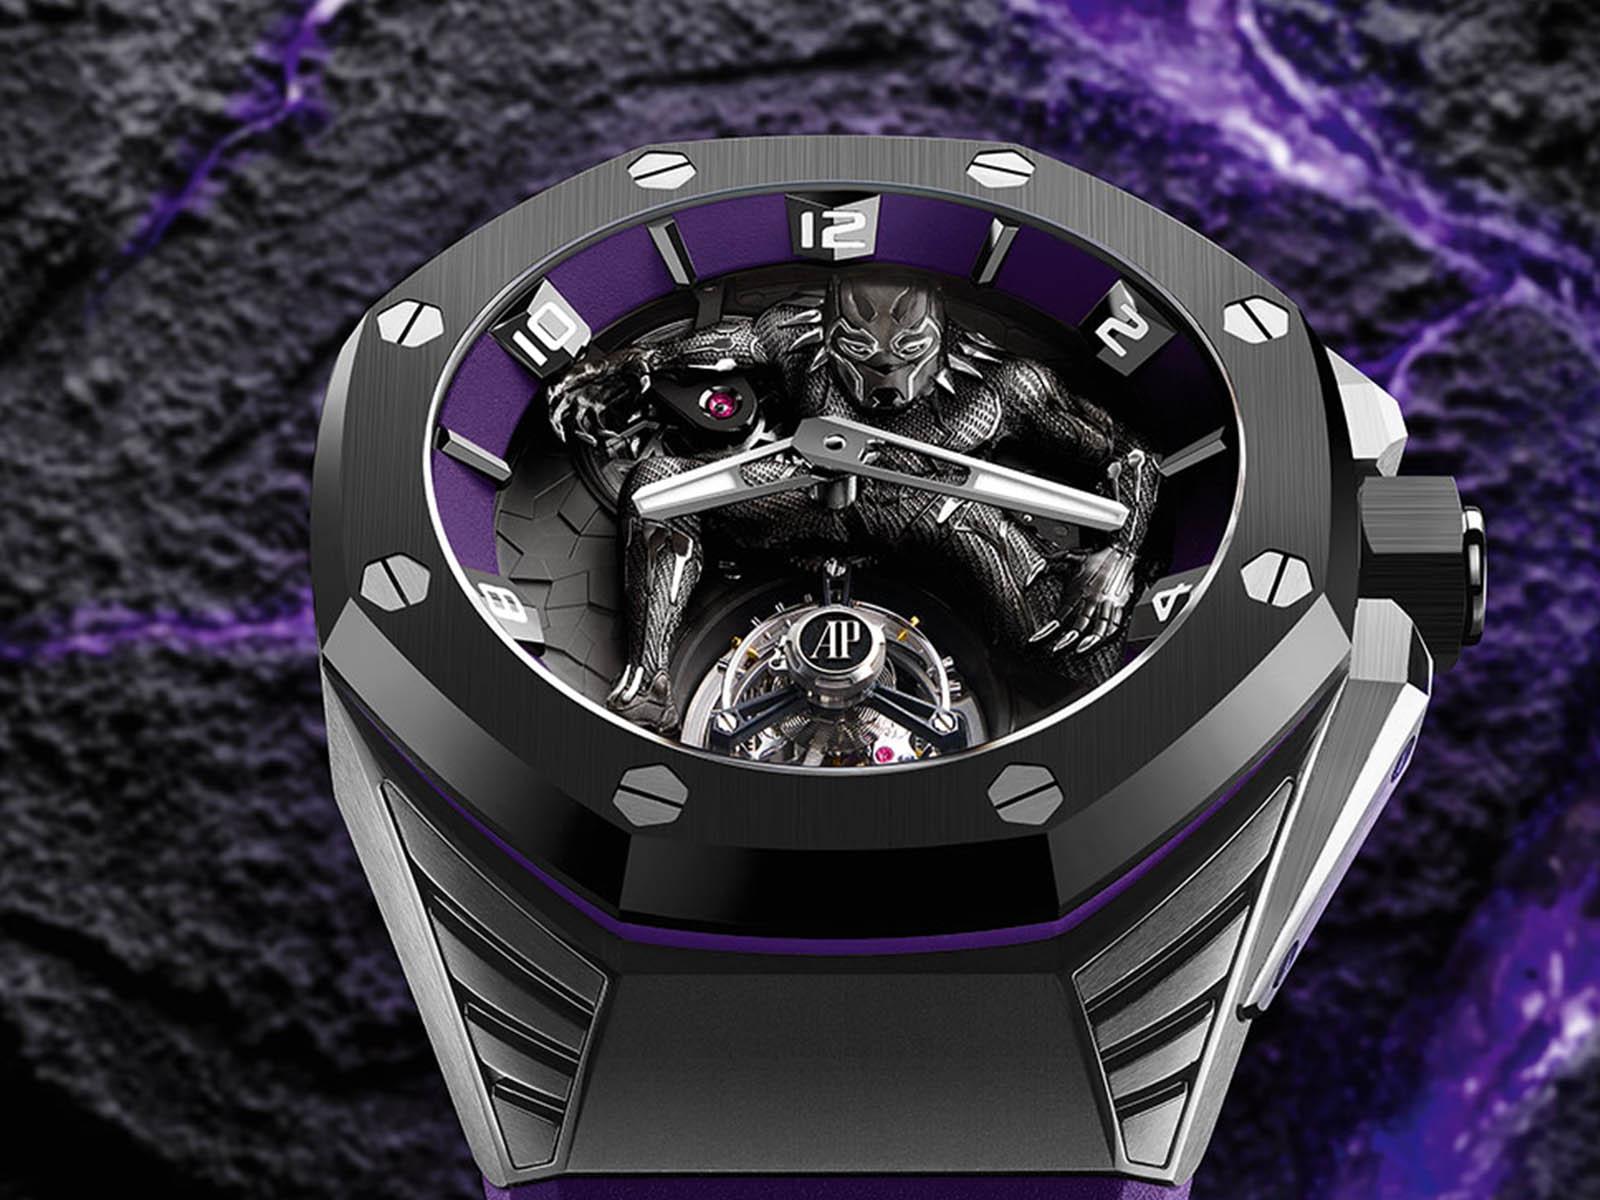 26620io-oo-d077ca-01-audemars-piguet-marvel-royal-oak-concept-black-panther-6.jpg